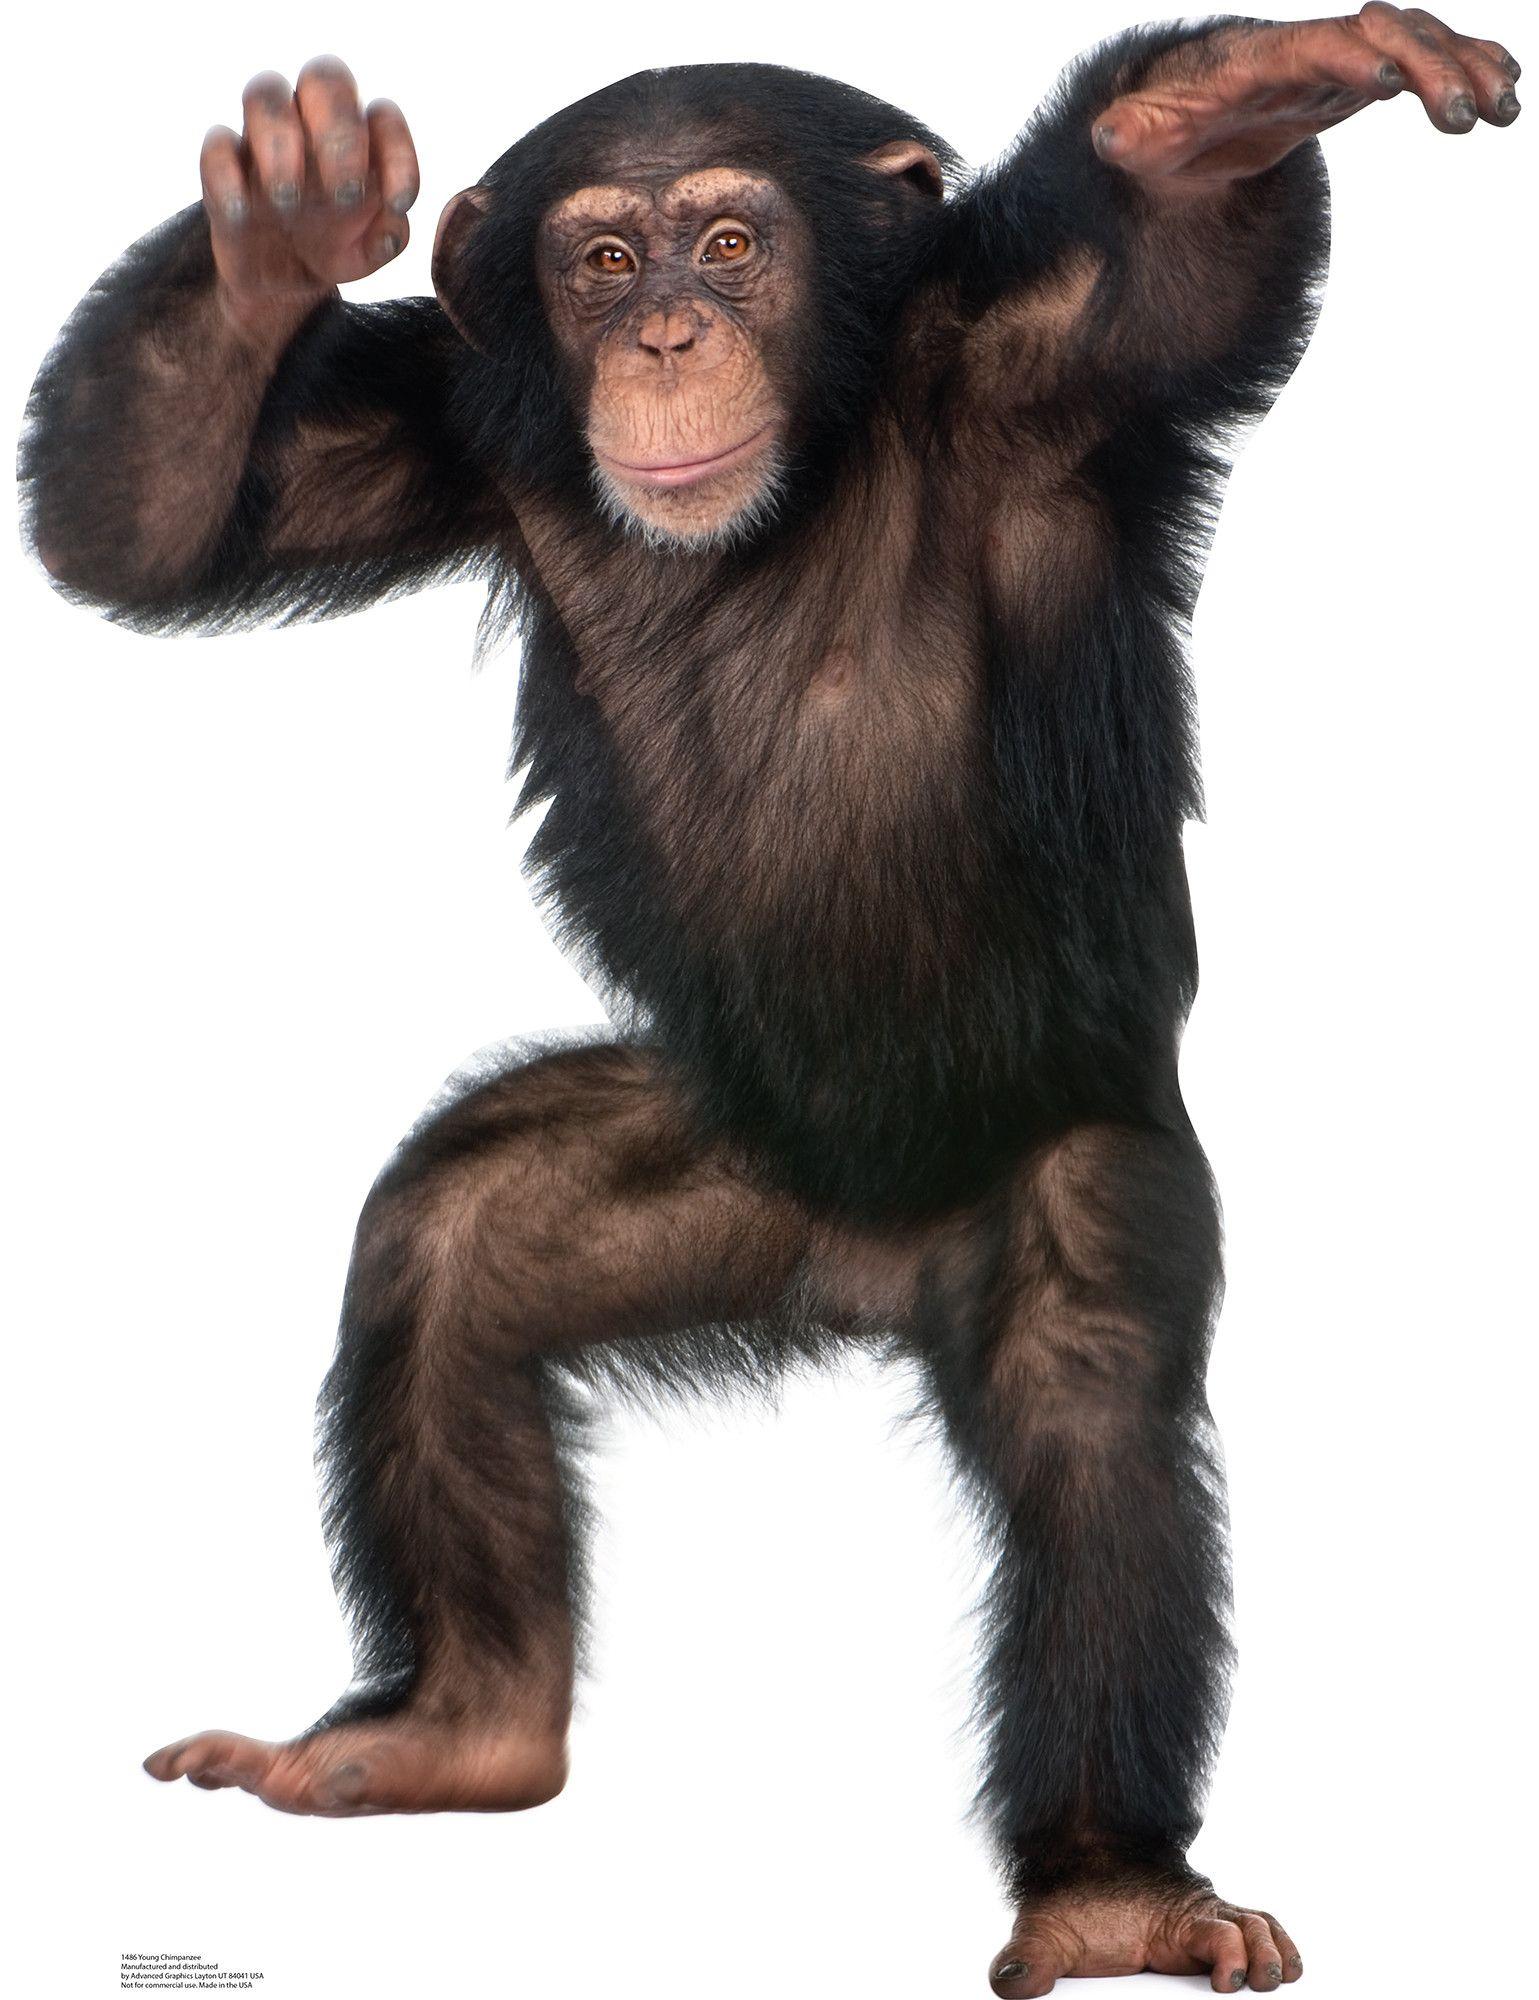 Young Chimpanzee Cardboard Stand- Cute Animals